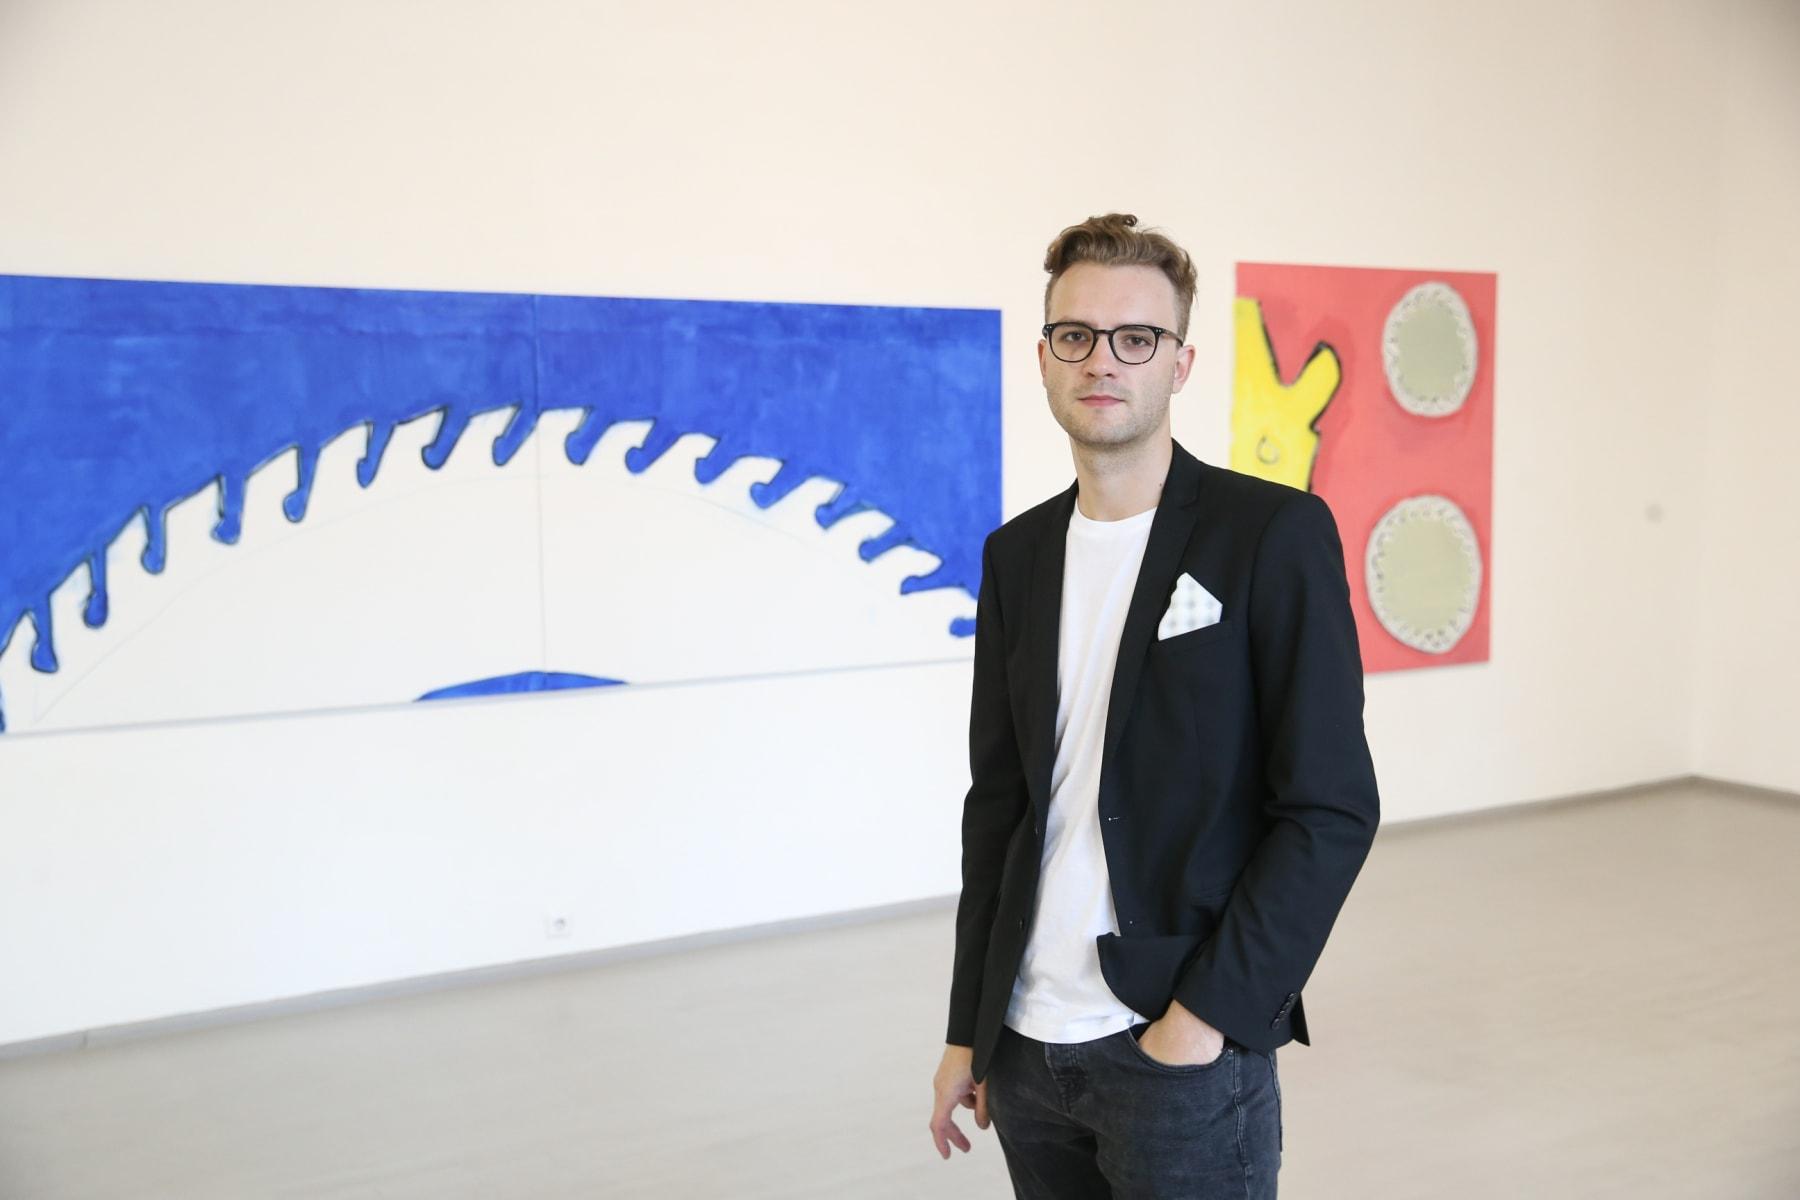 Galerija Vartai, 2019 Dominykas Sidorovas at the opeining of his solo exhibition